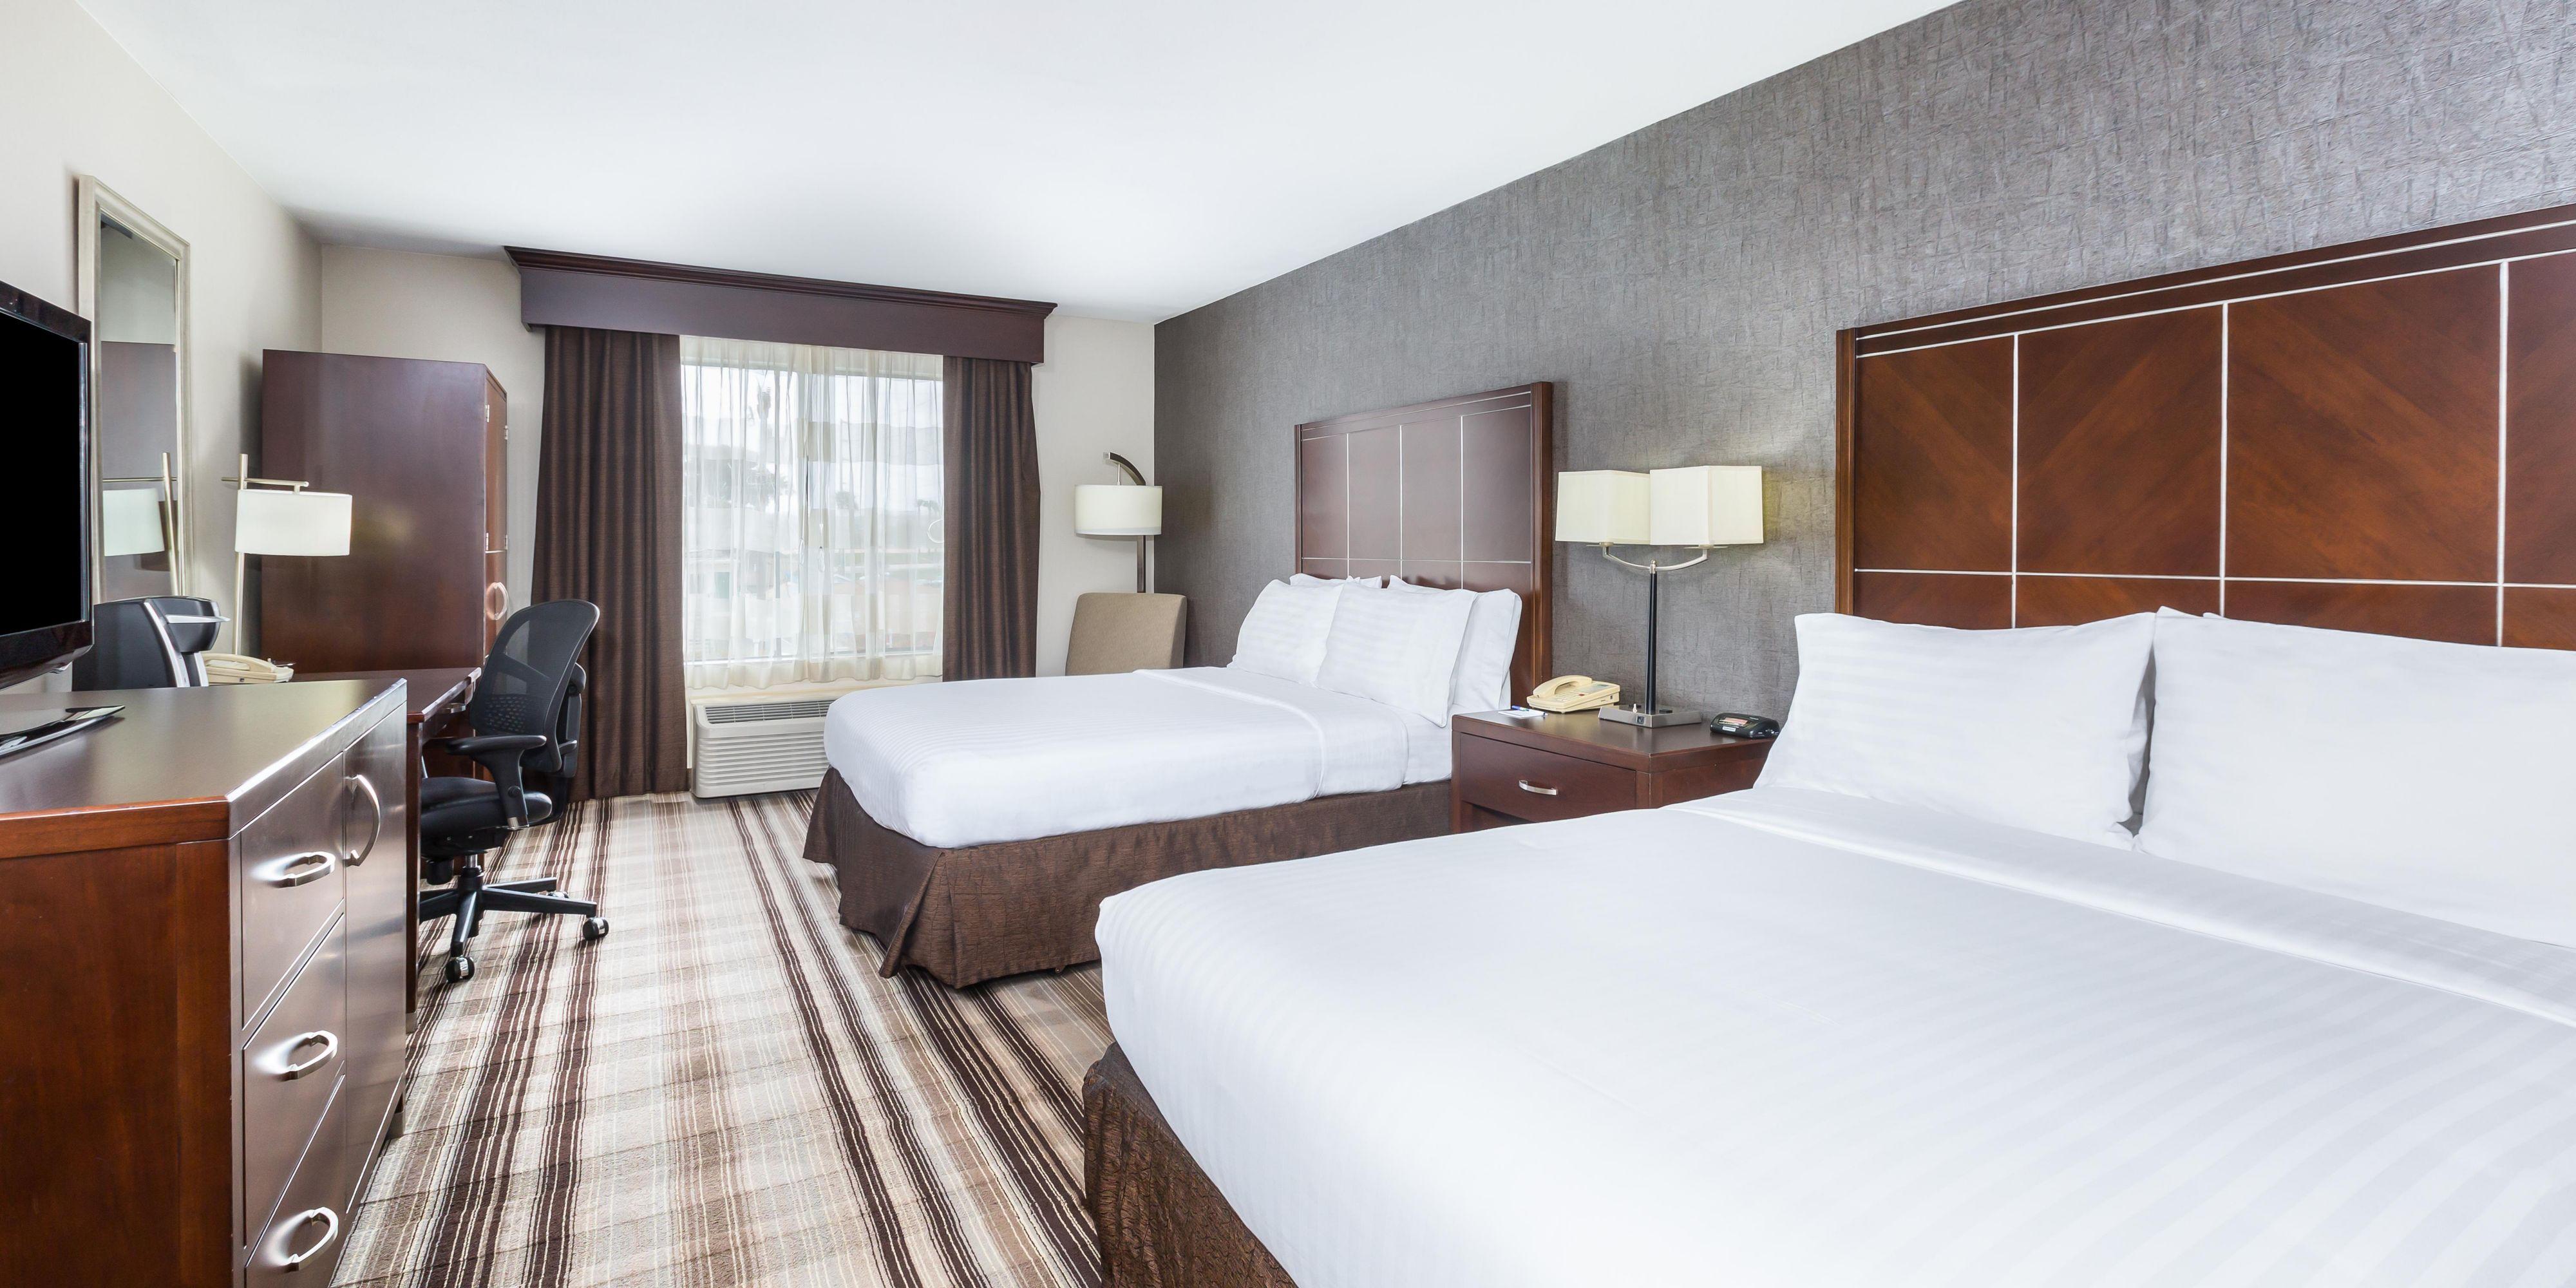 Holiday Inn Express San Diego 4561253952 2x1